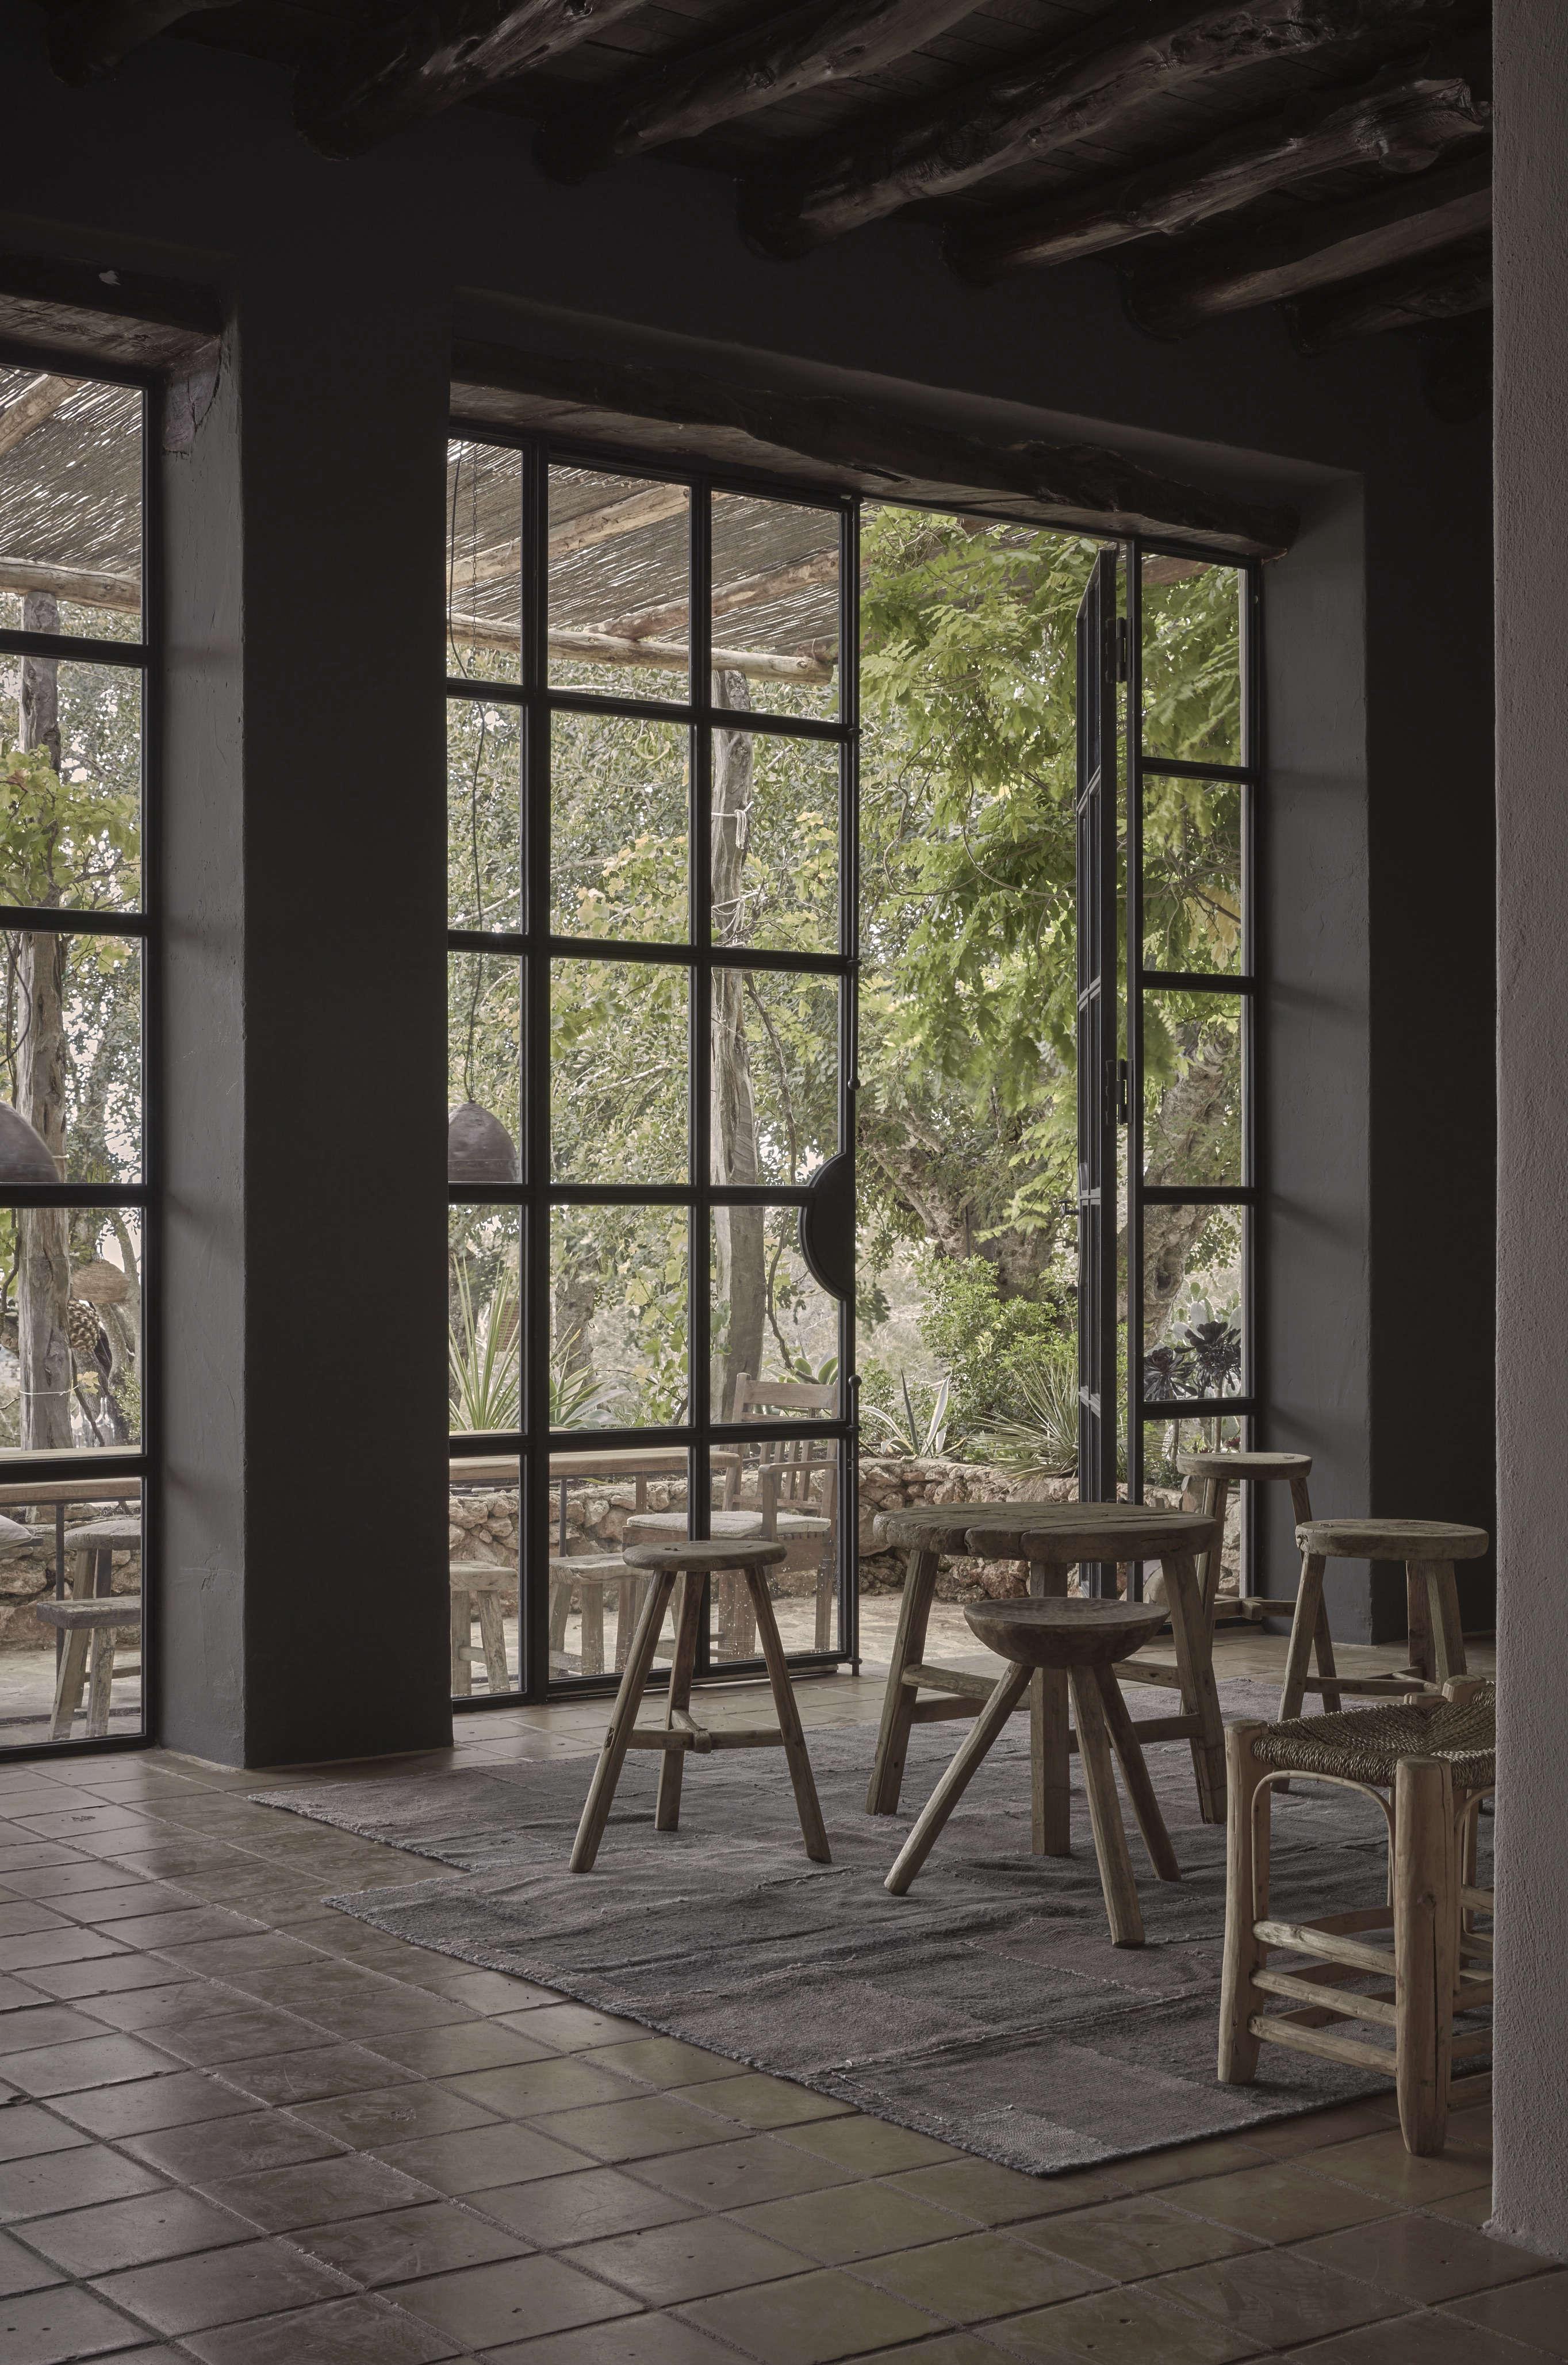 Steel-framed windows at La Granja Ibiza, a Design Hotels retreat on a 16th century finca | Remodelista